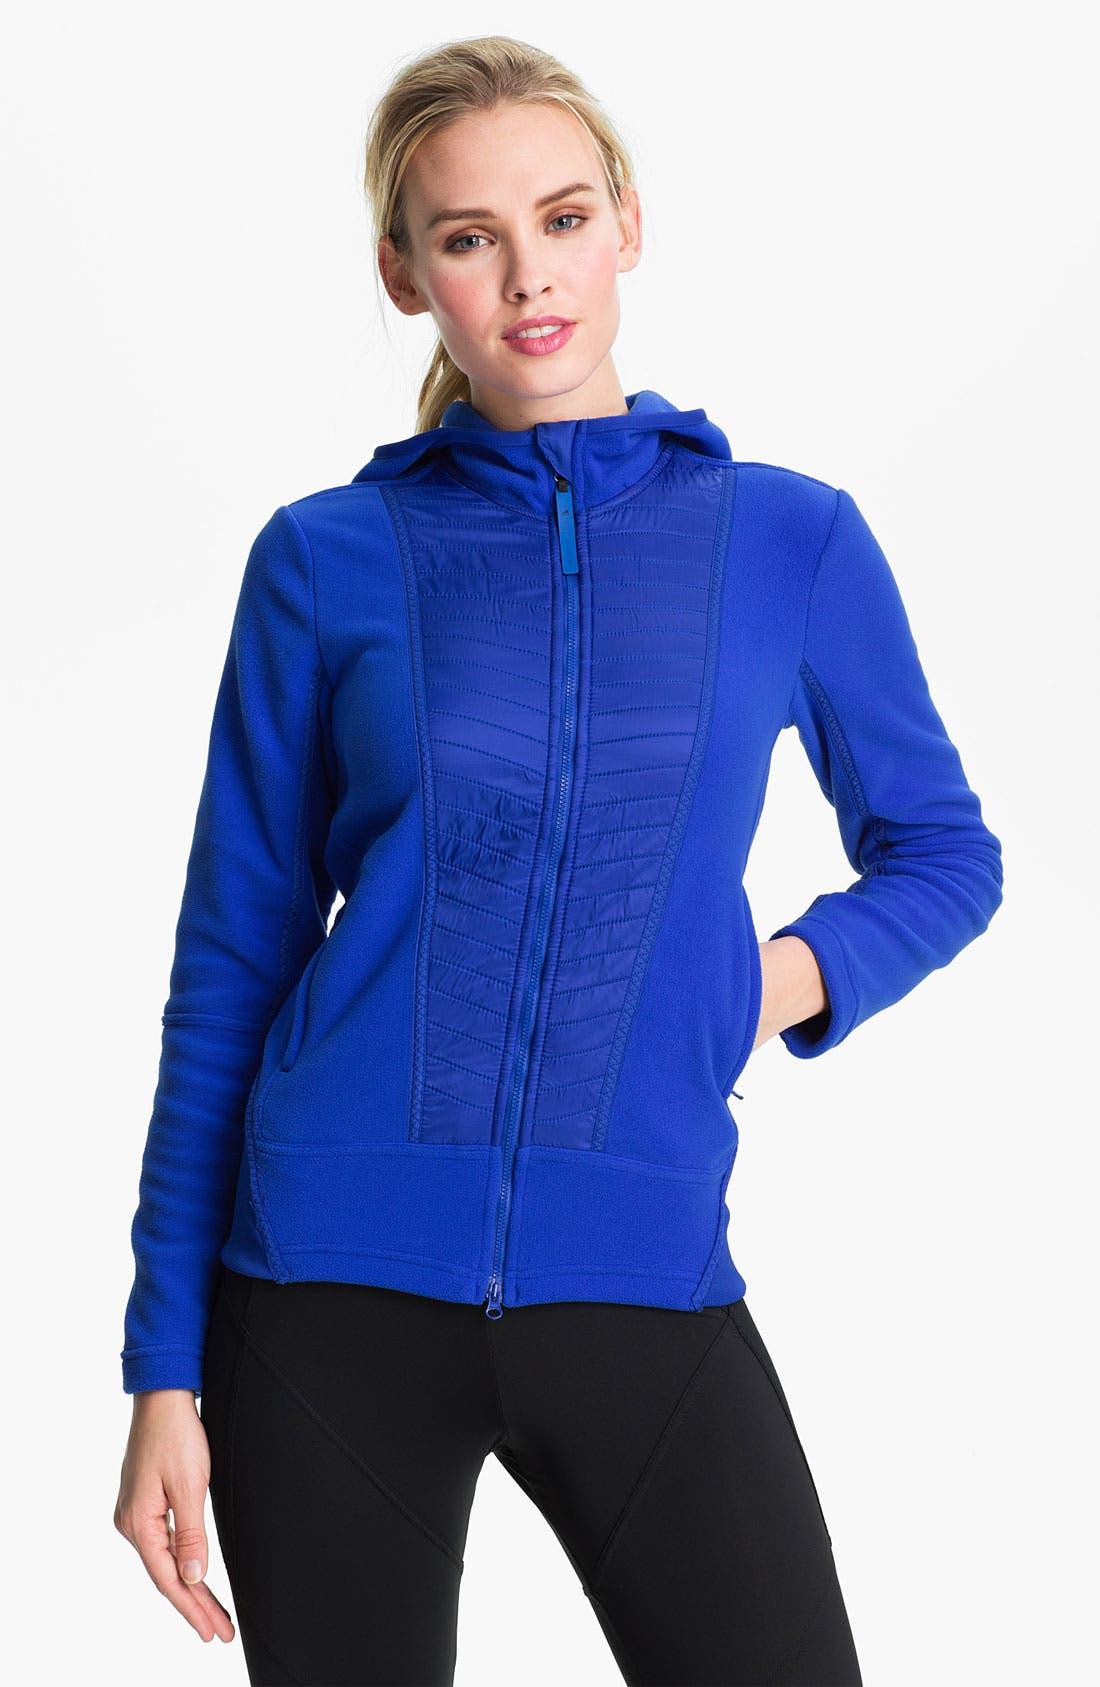 Main Image - adidas by Stella McCartney 'Wintersports' Performance Fleece Jacket